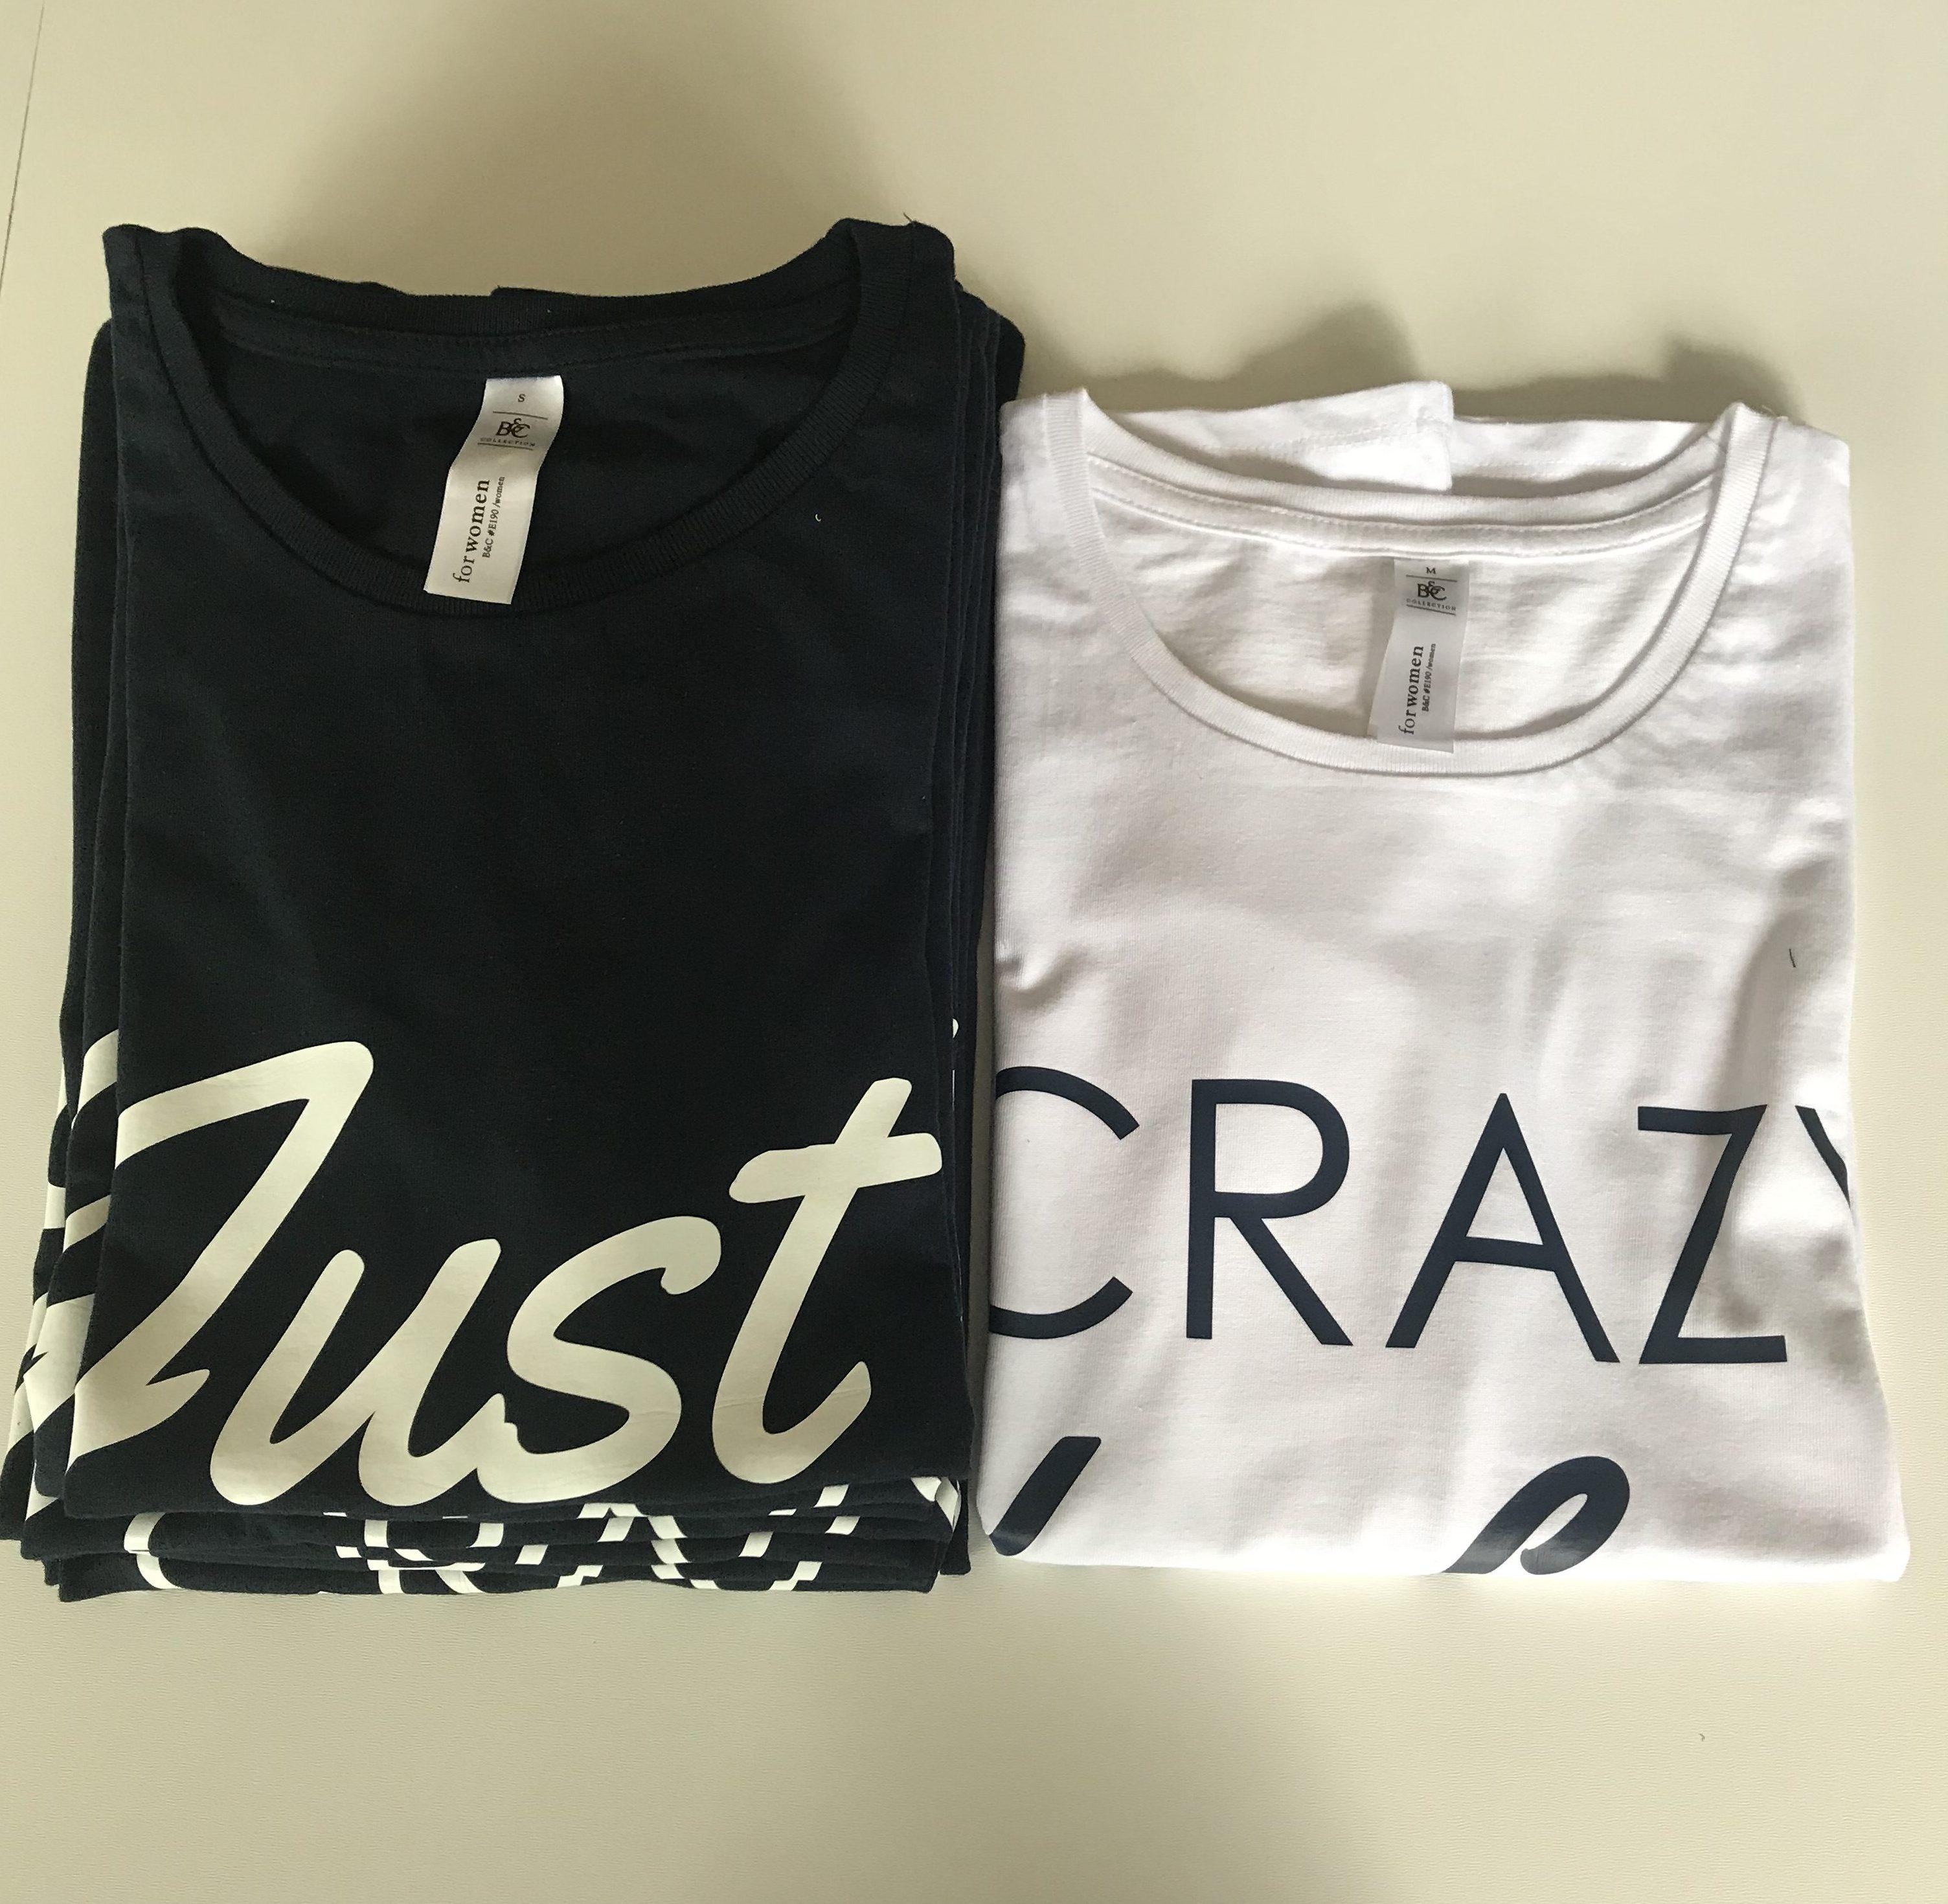 Just Crazy